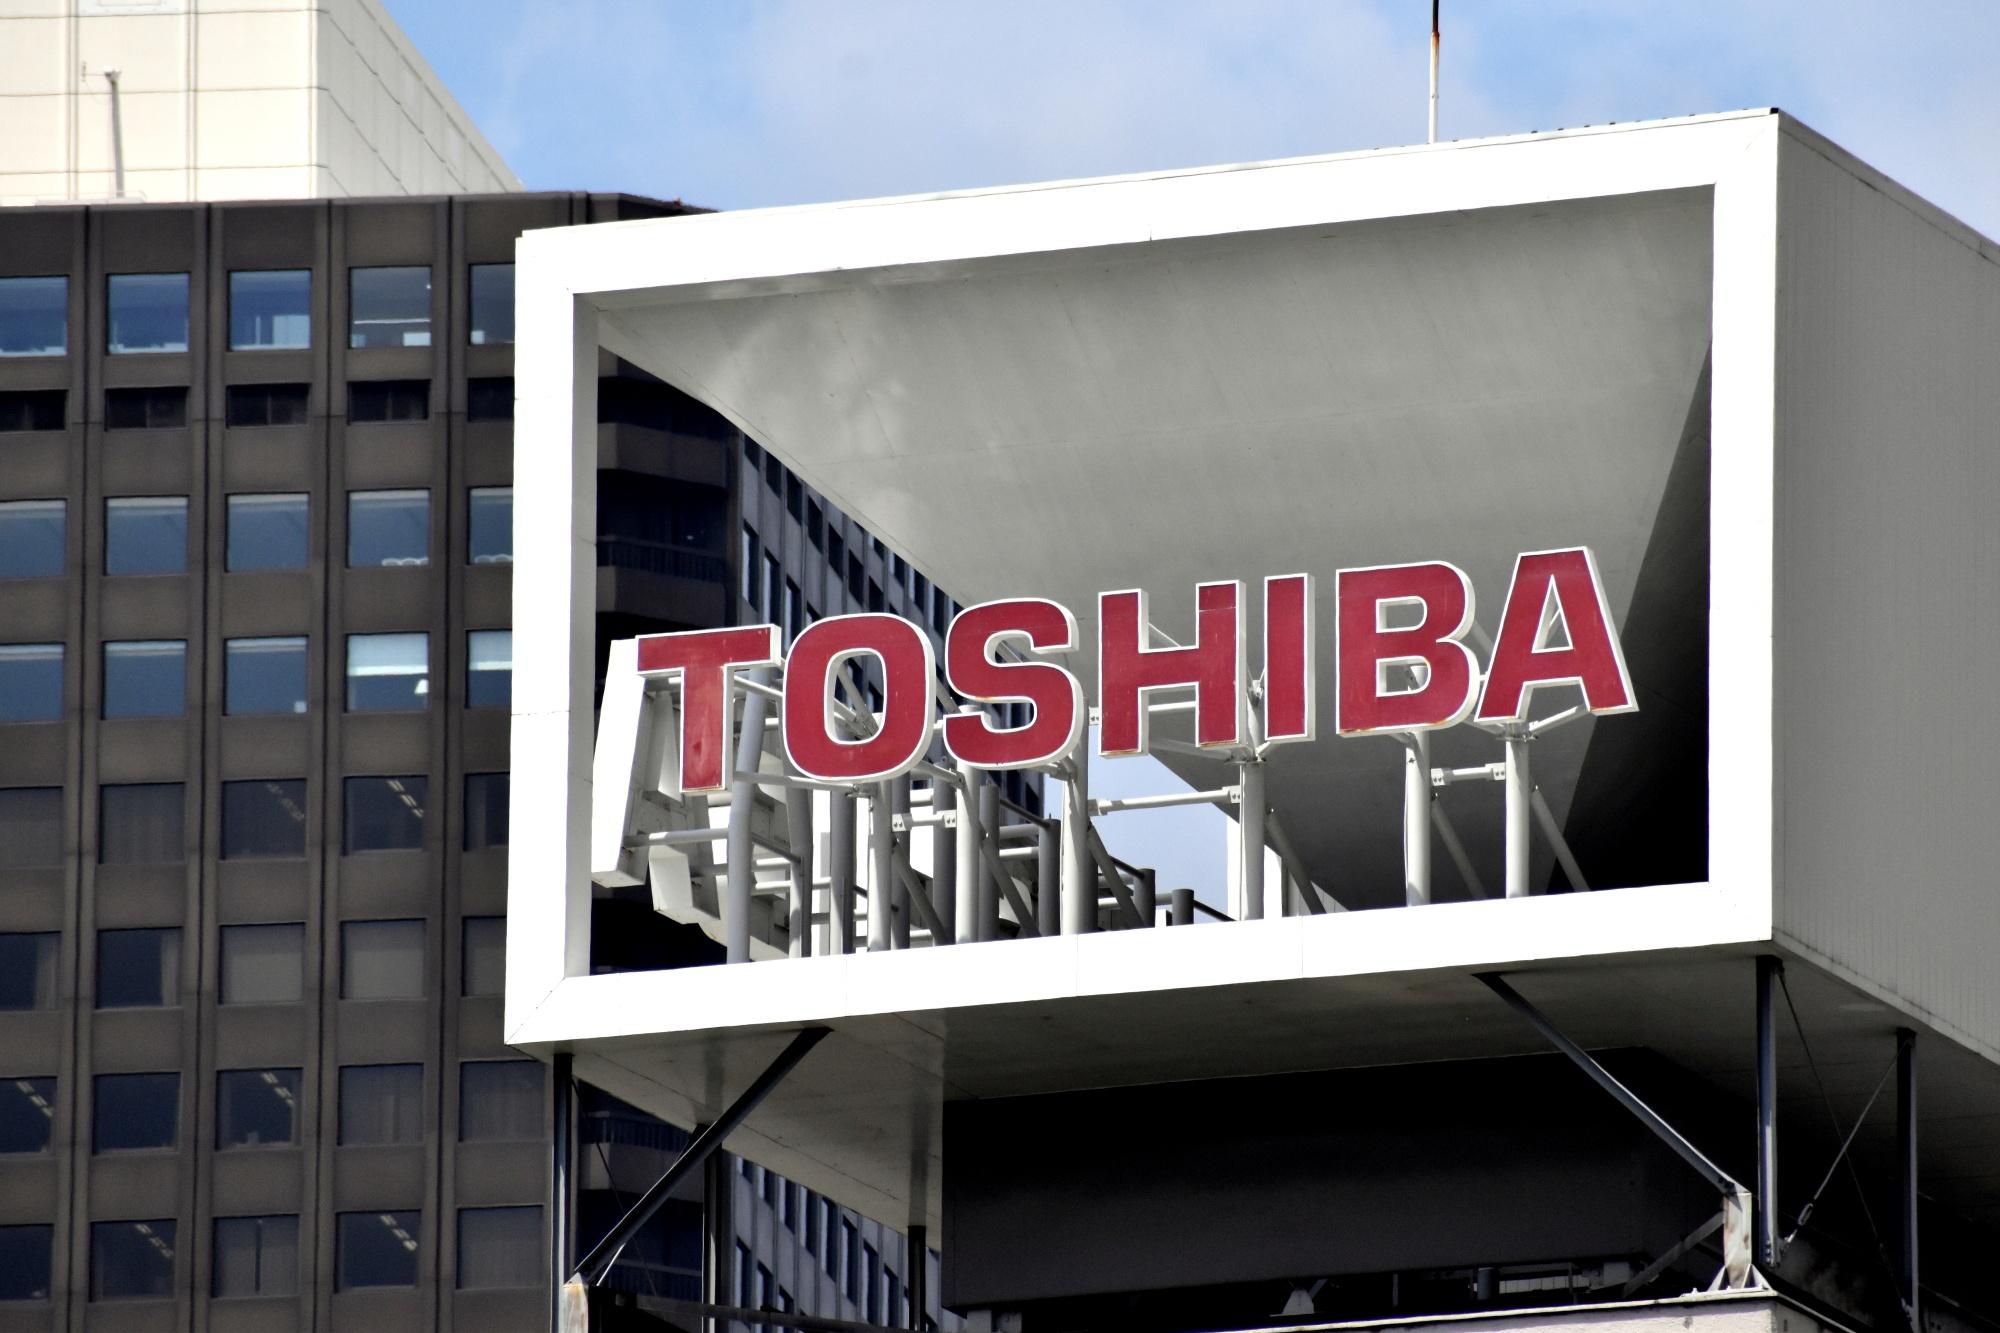 Toshiba muon ban minh anh 1